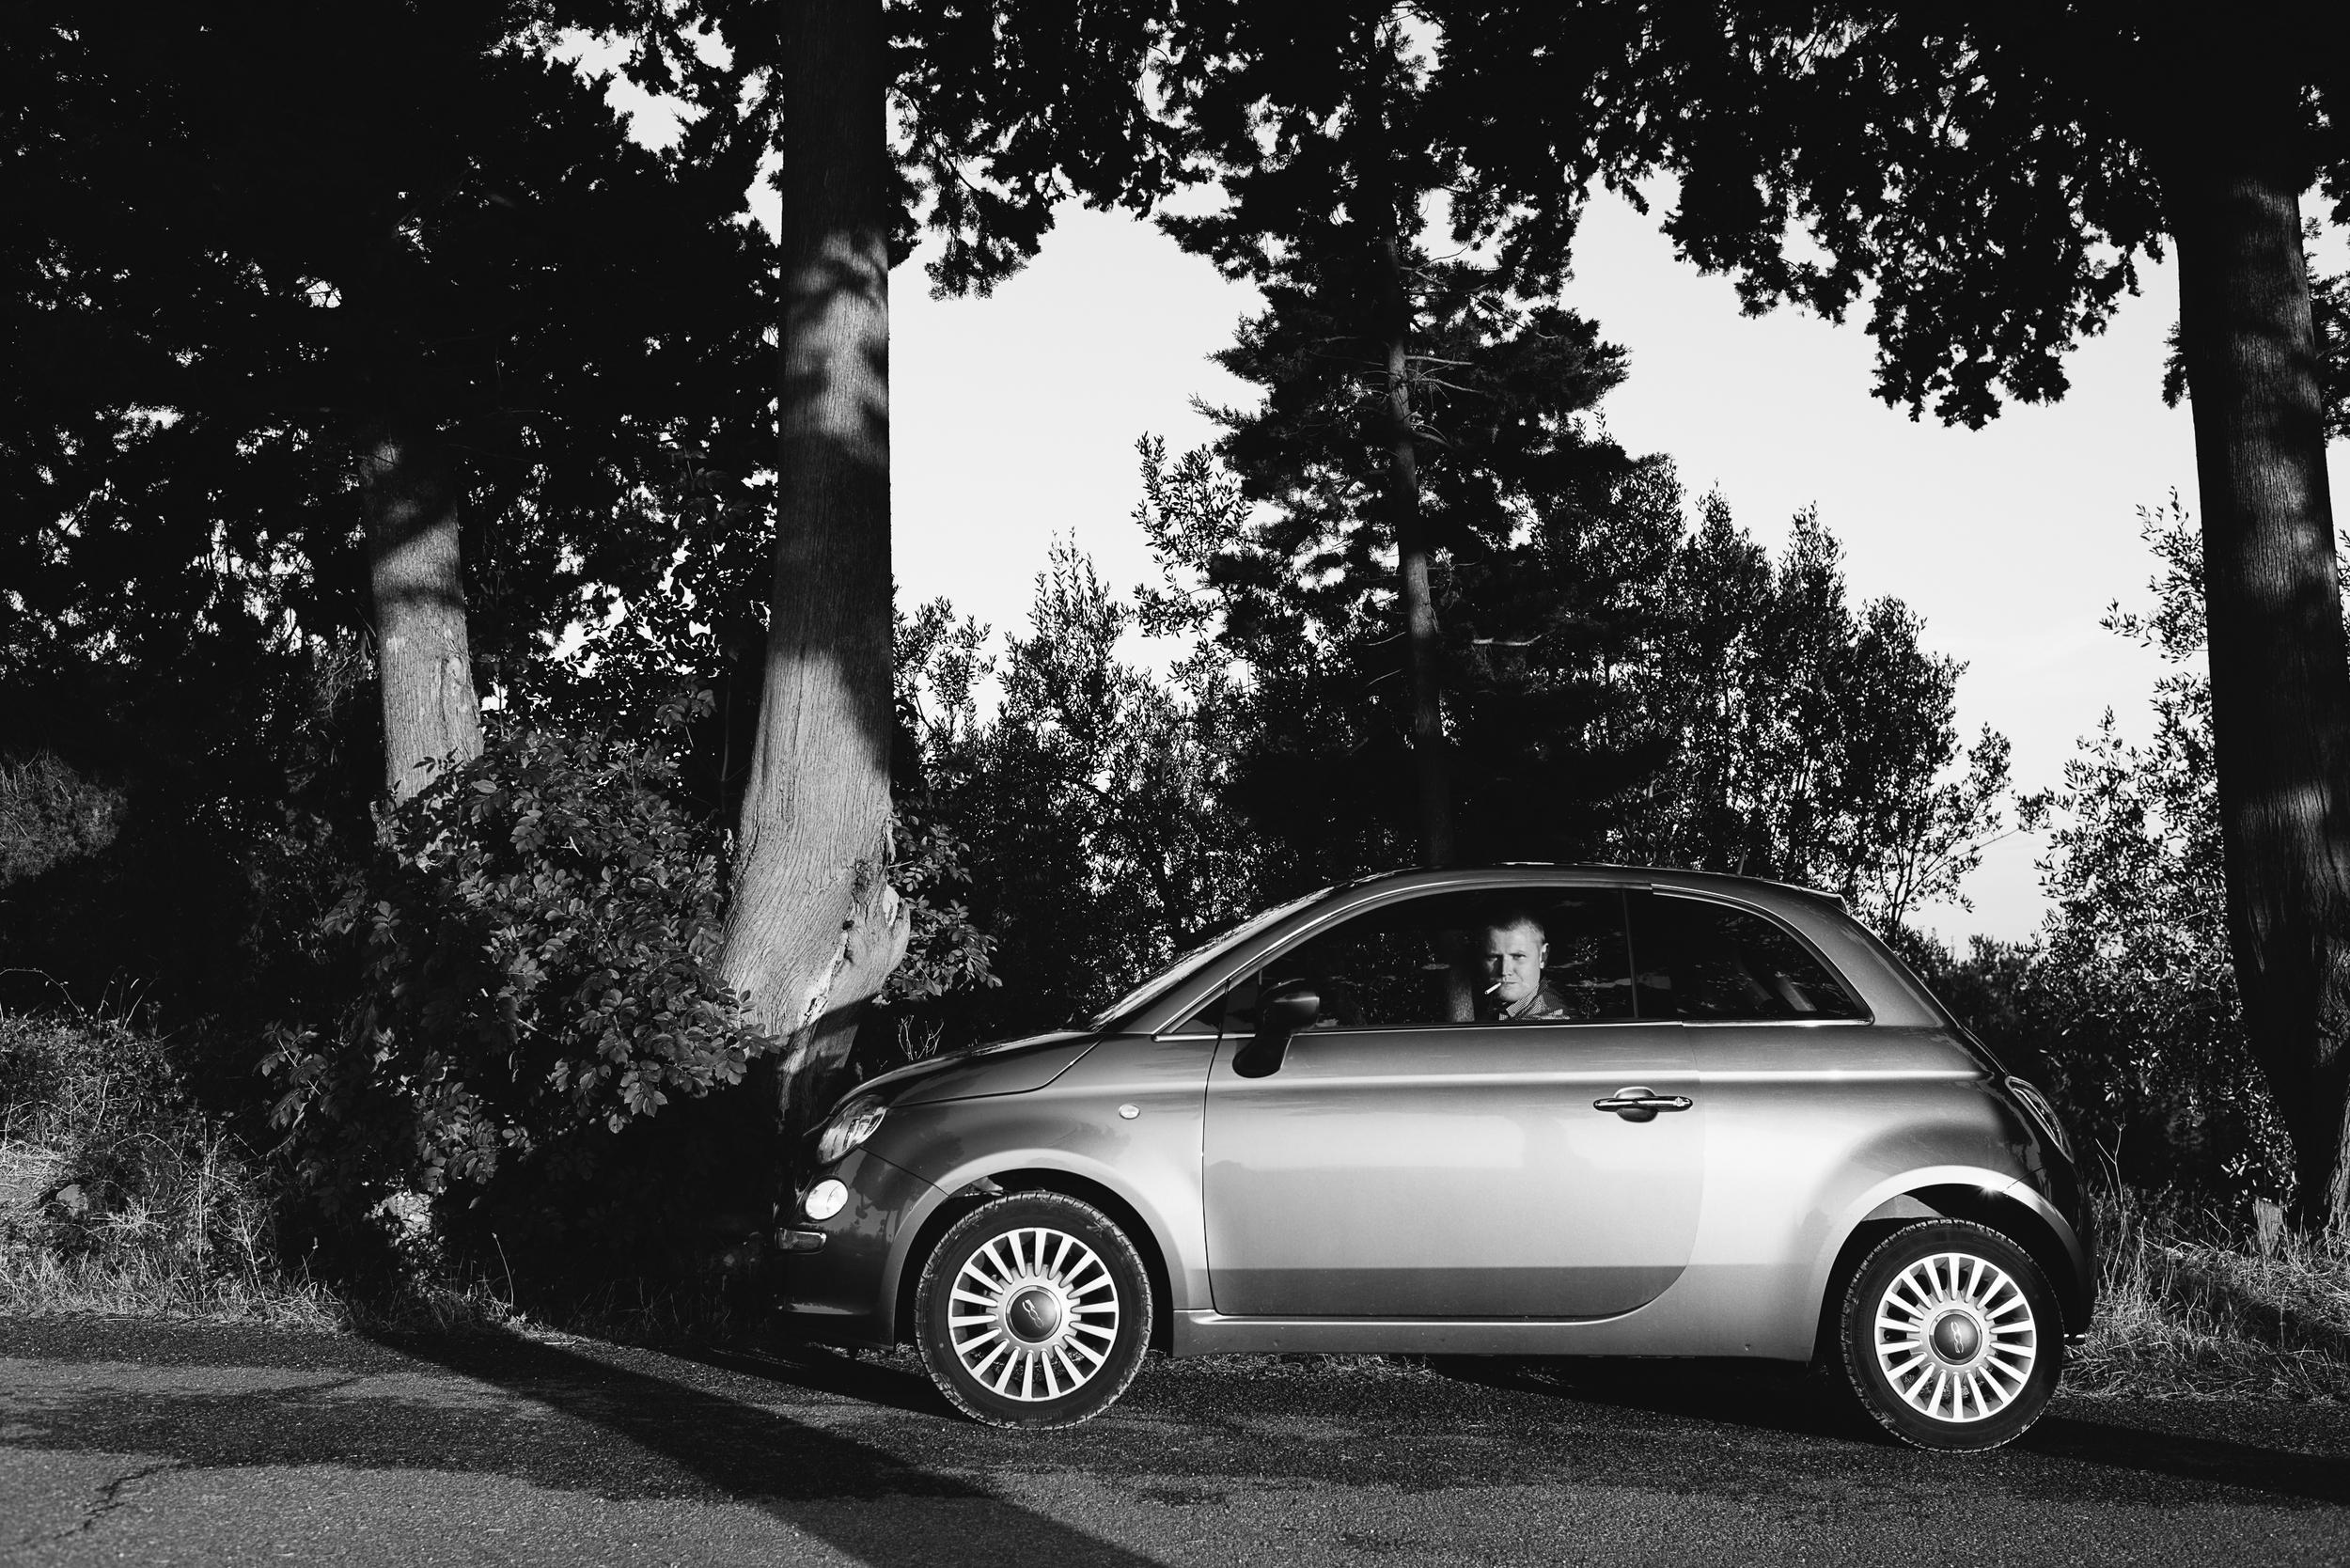 20140816-Tuscany283.jpg